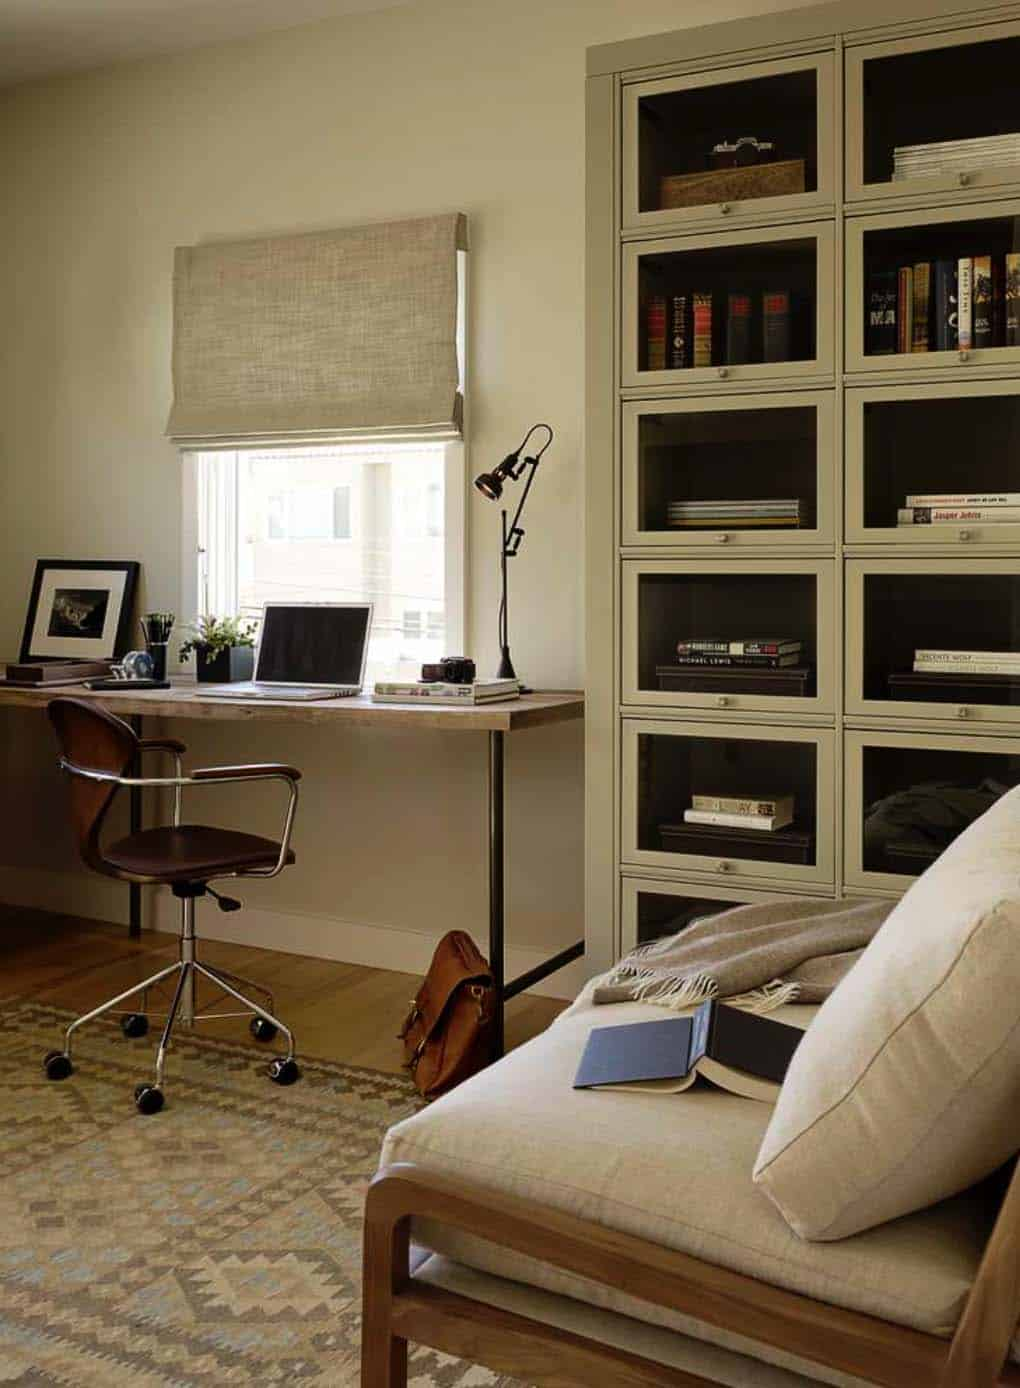 Design d'intérieur contemporain-Jute Interior Design-07-1 Kindesign